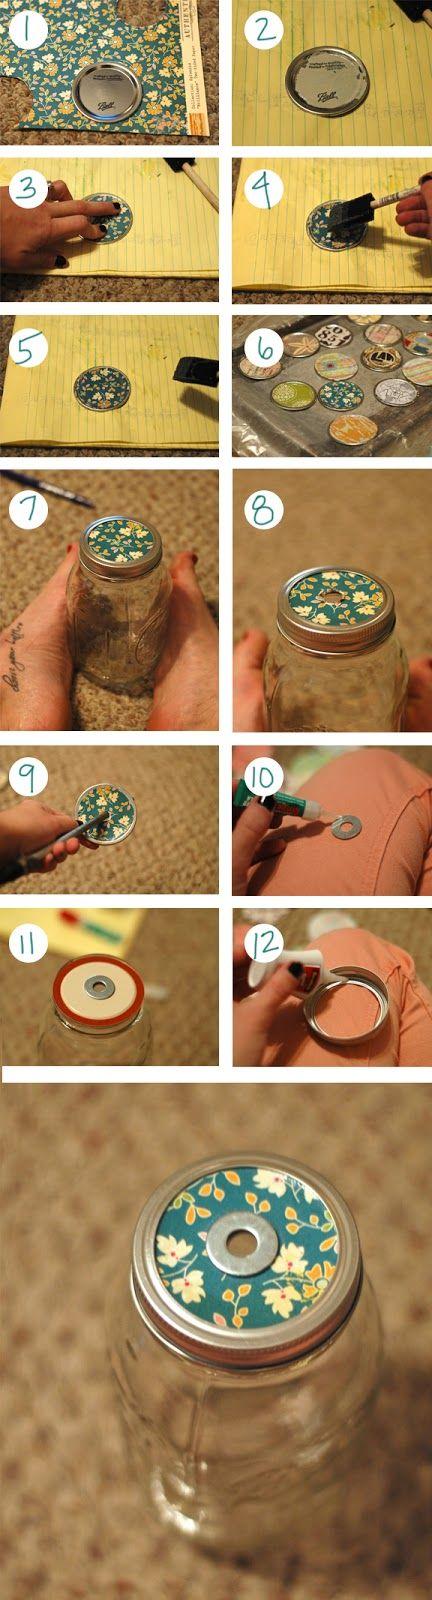 Cold Hands Warm Heart: DIY | MASON JAR TO-GO CUP